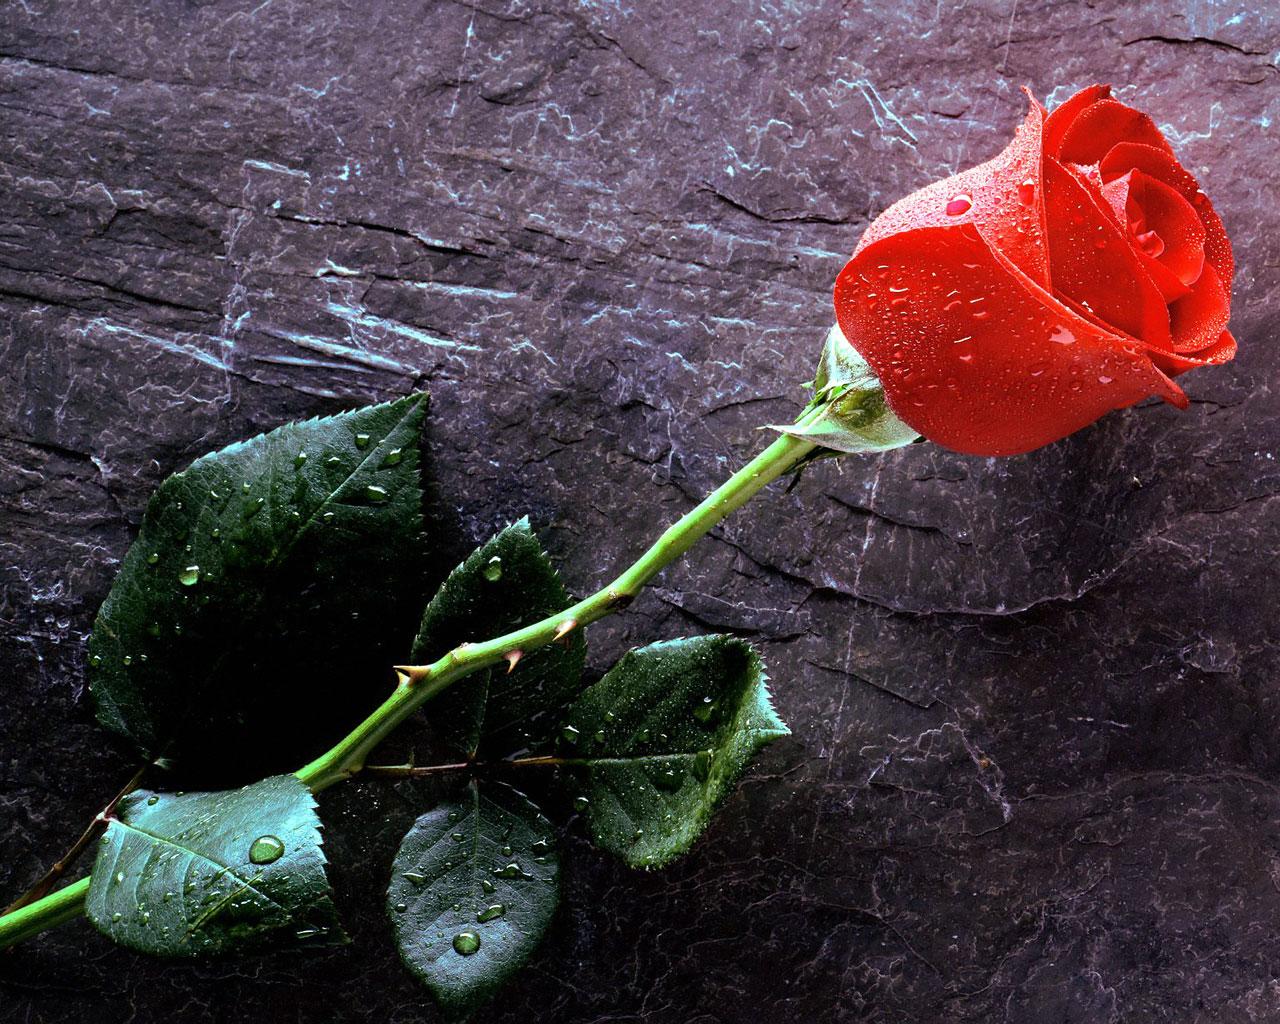 http://2.bp.blogspot.com/-WjwvVtpY4xk/TyGBSV85sSI/AAAAAAAABfM/CI0LCy81MqI/s1600/True-Love-Forever-Red-Rose-Wallpaper.jpg